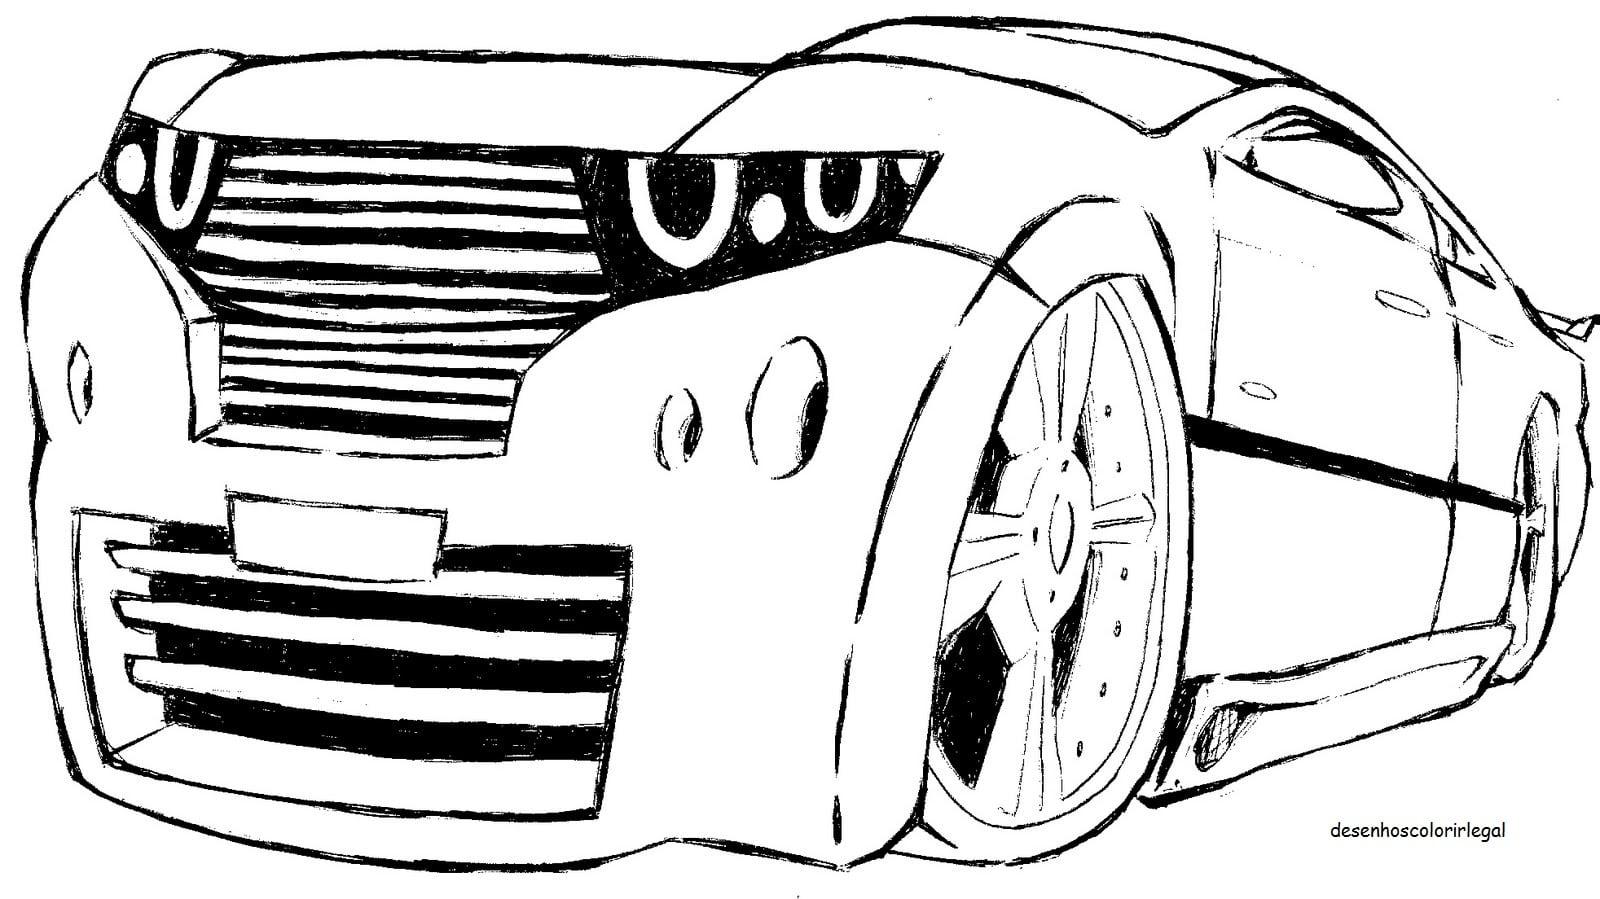 Desenhos Colorir Legal  Desenho De Carro Tuning Para Colorir E